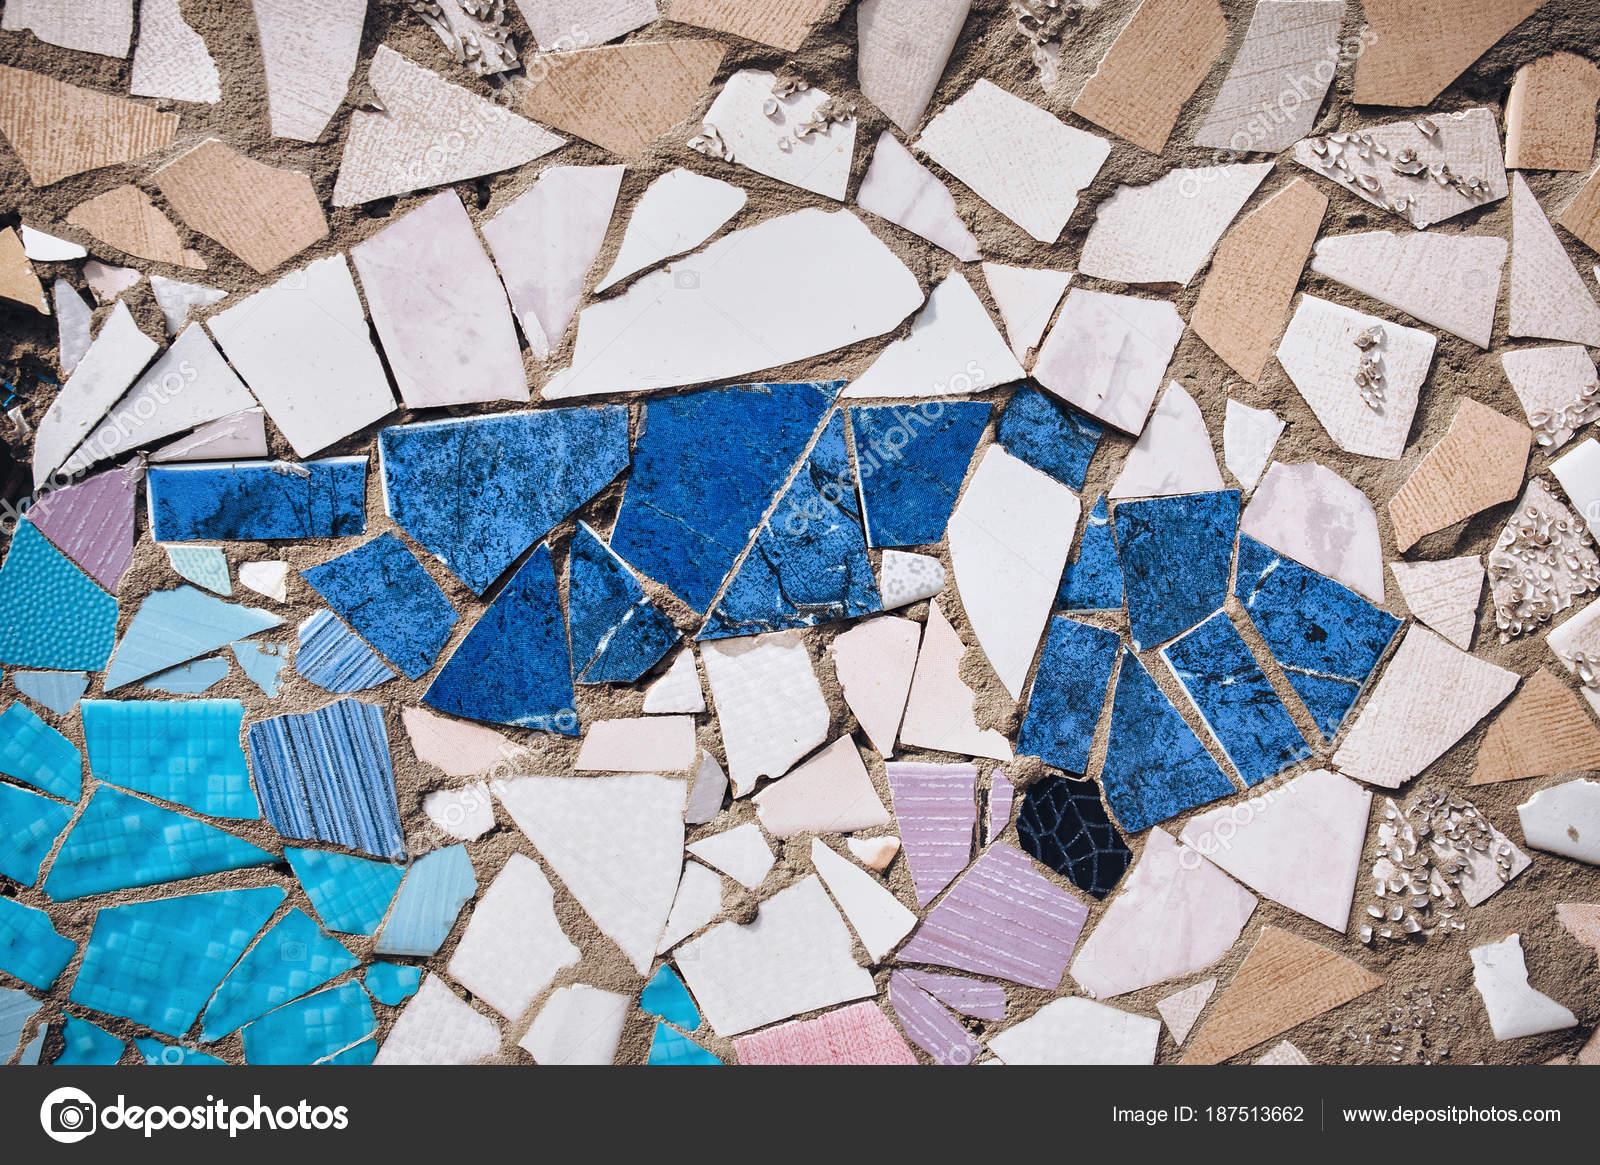 Mosaic Wall Decorative Ornament Ceramic Broken Tiles Decorative ...